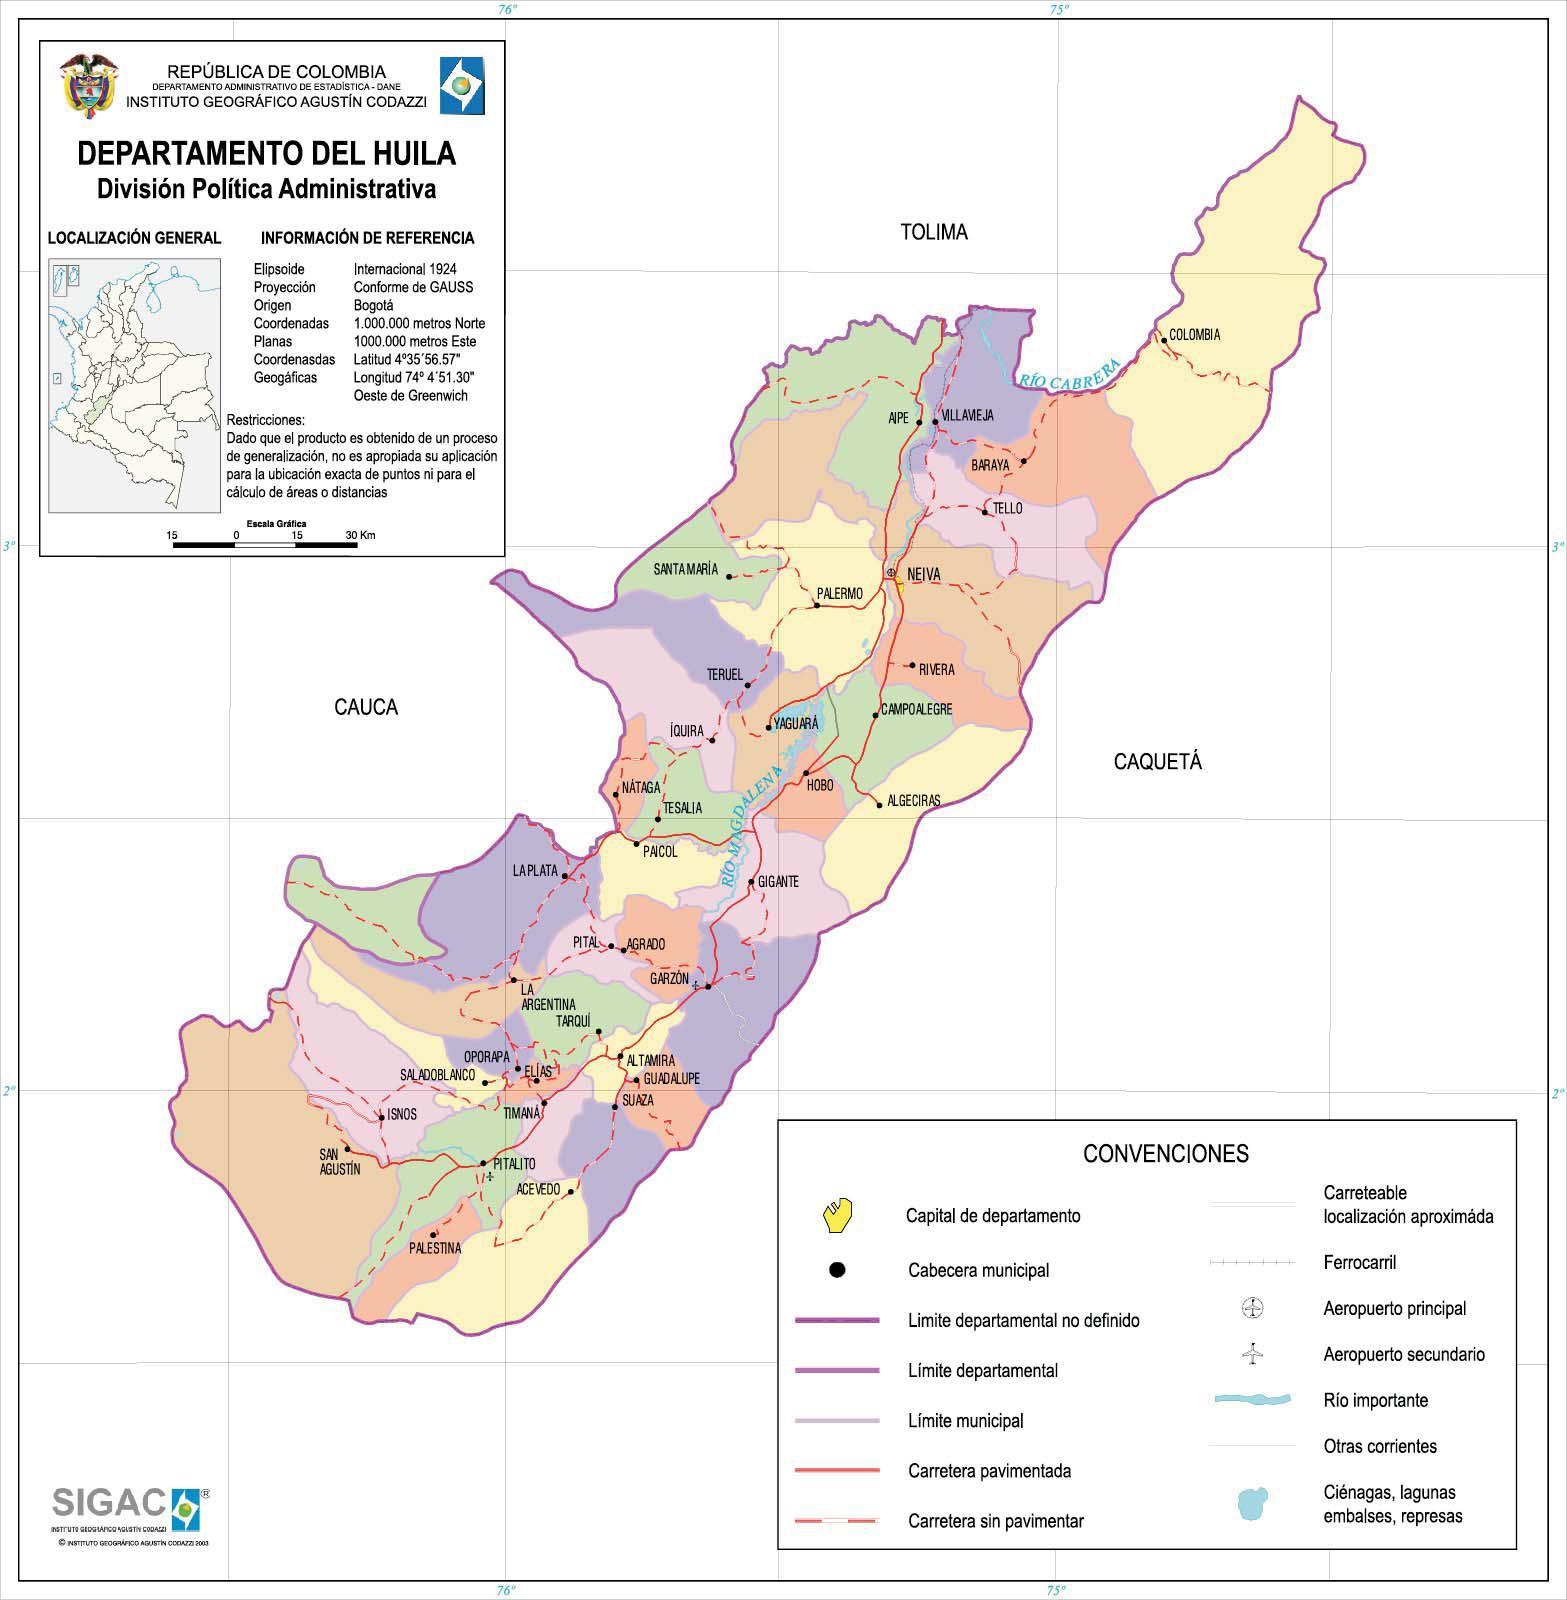 Mapa del Departamento del Huila, Colombia